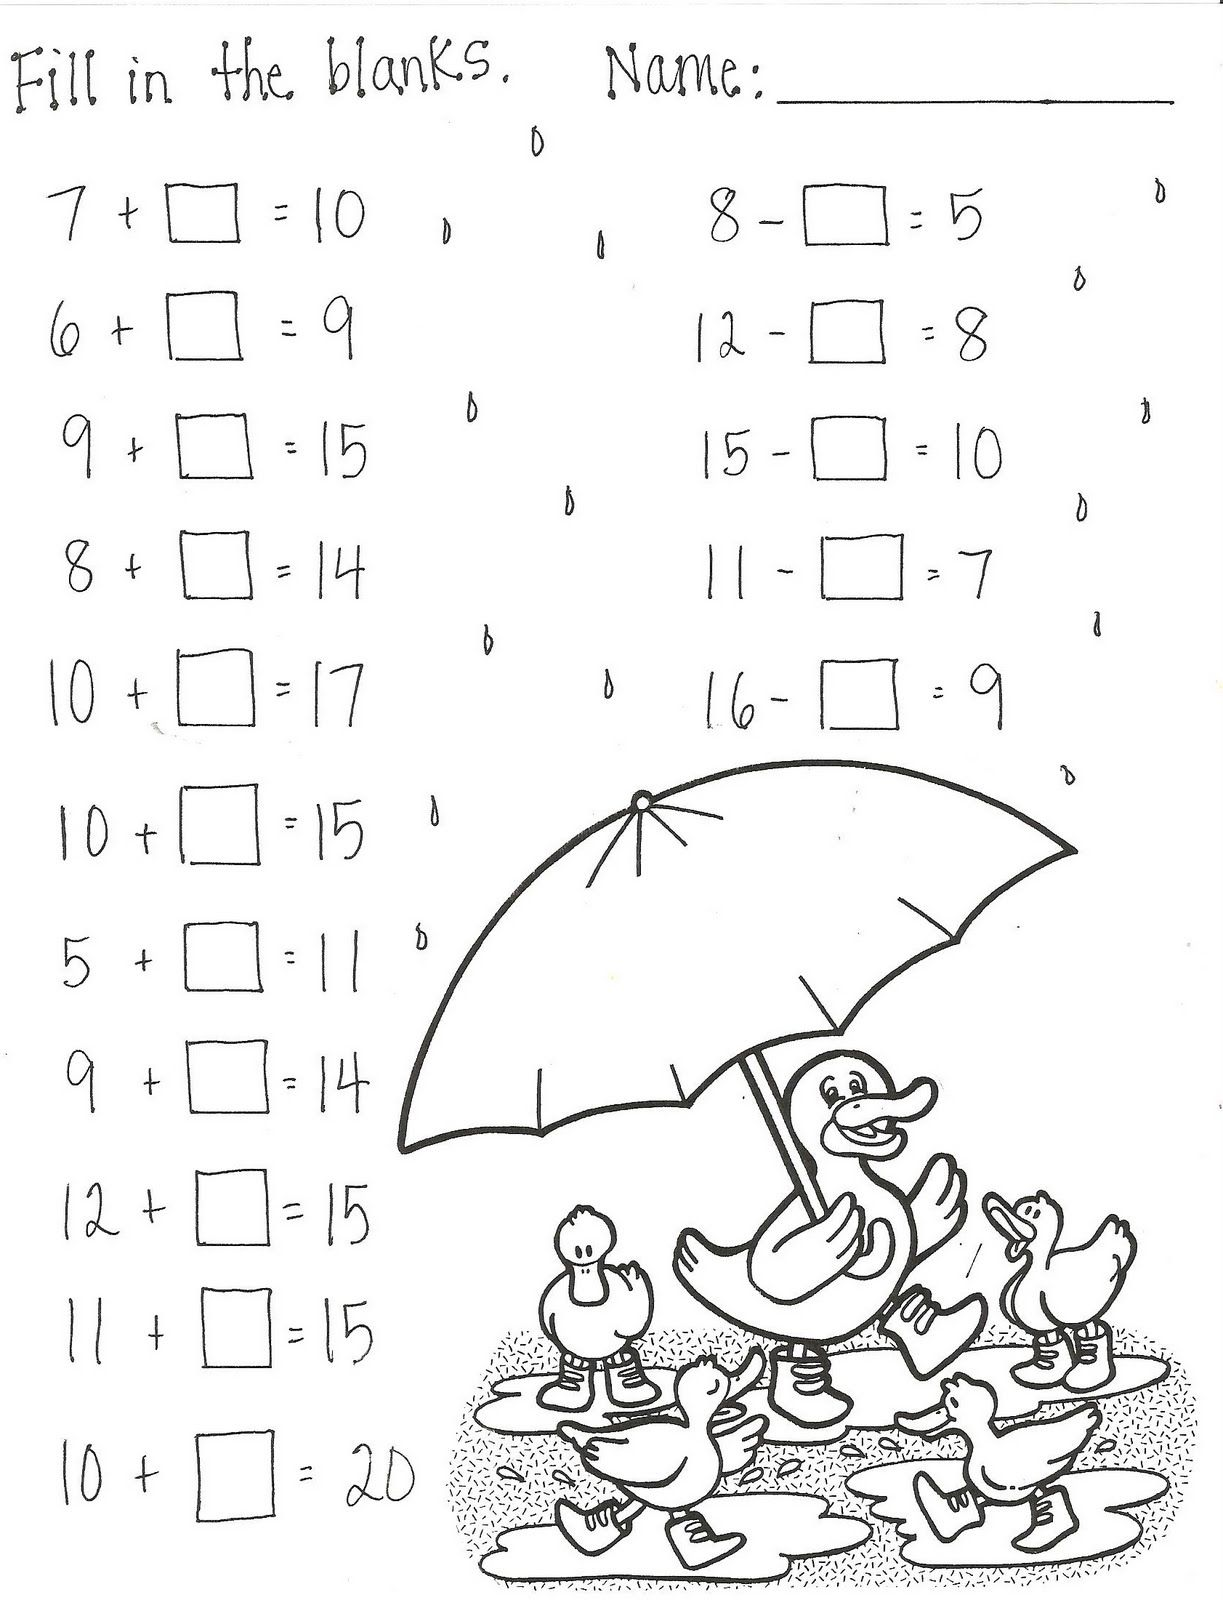 Worksheets Dr Seuss Math Worksheets dr seuss subtraction worksheets double digit clipart addition subtraction